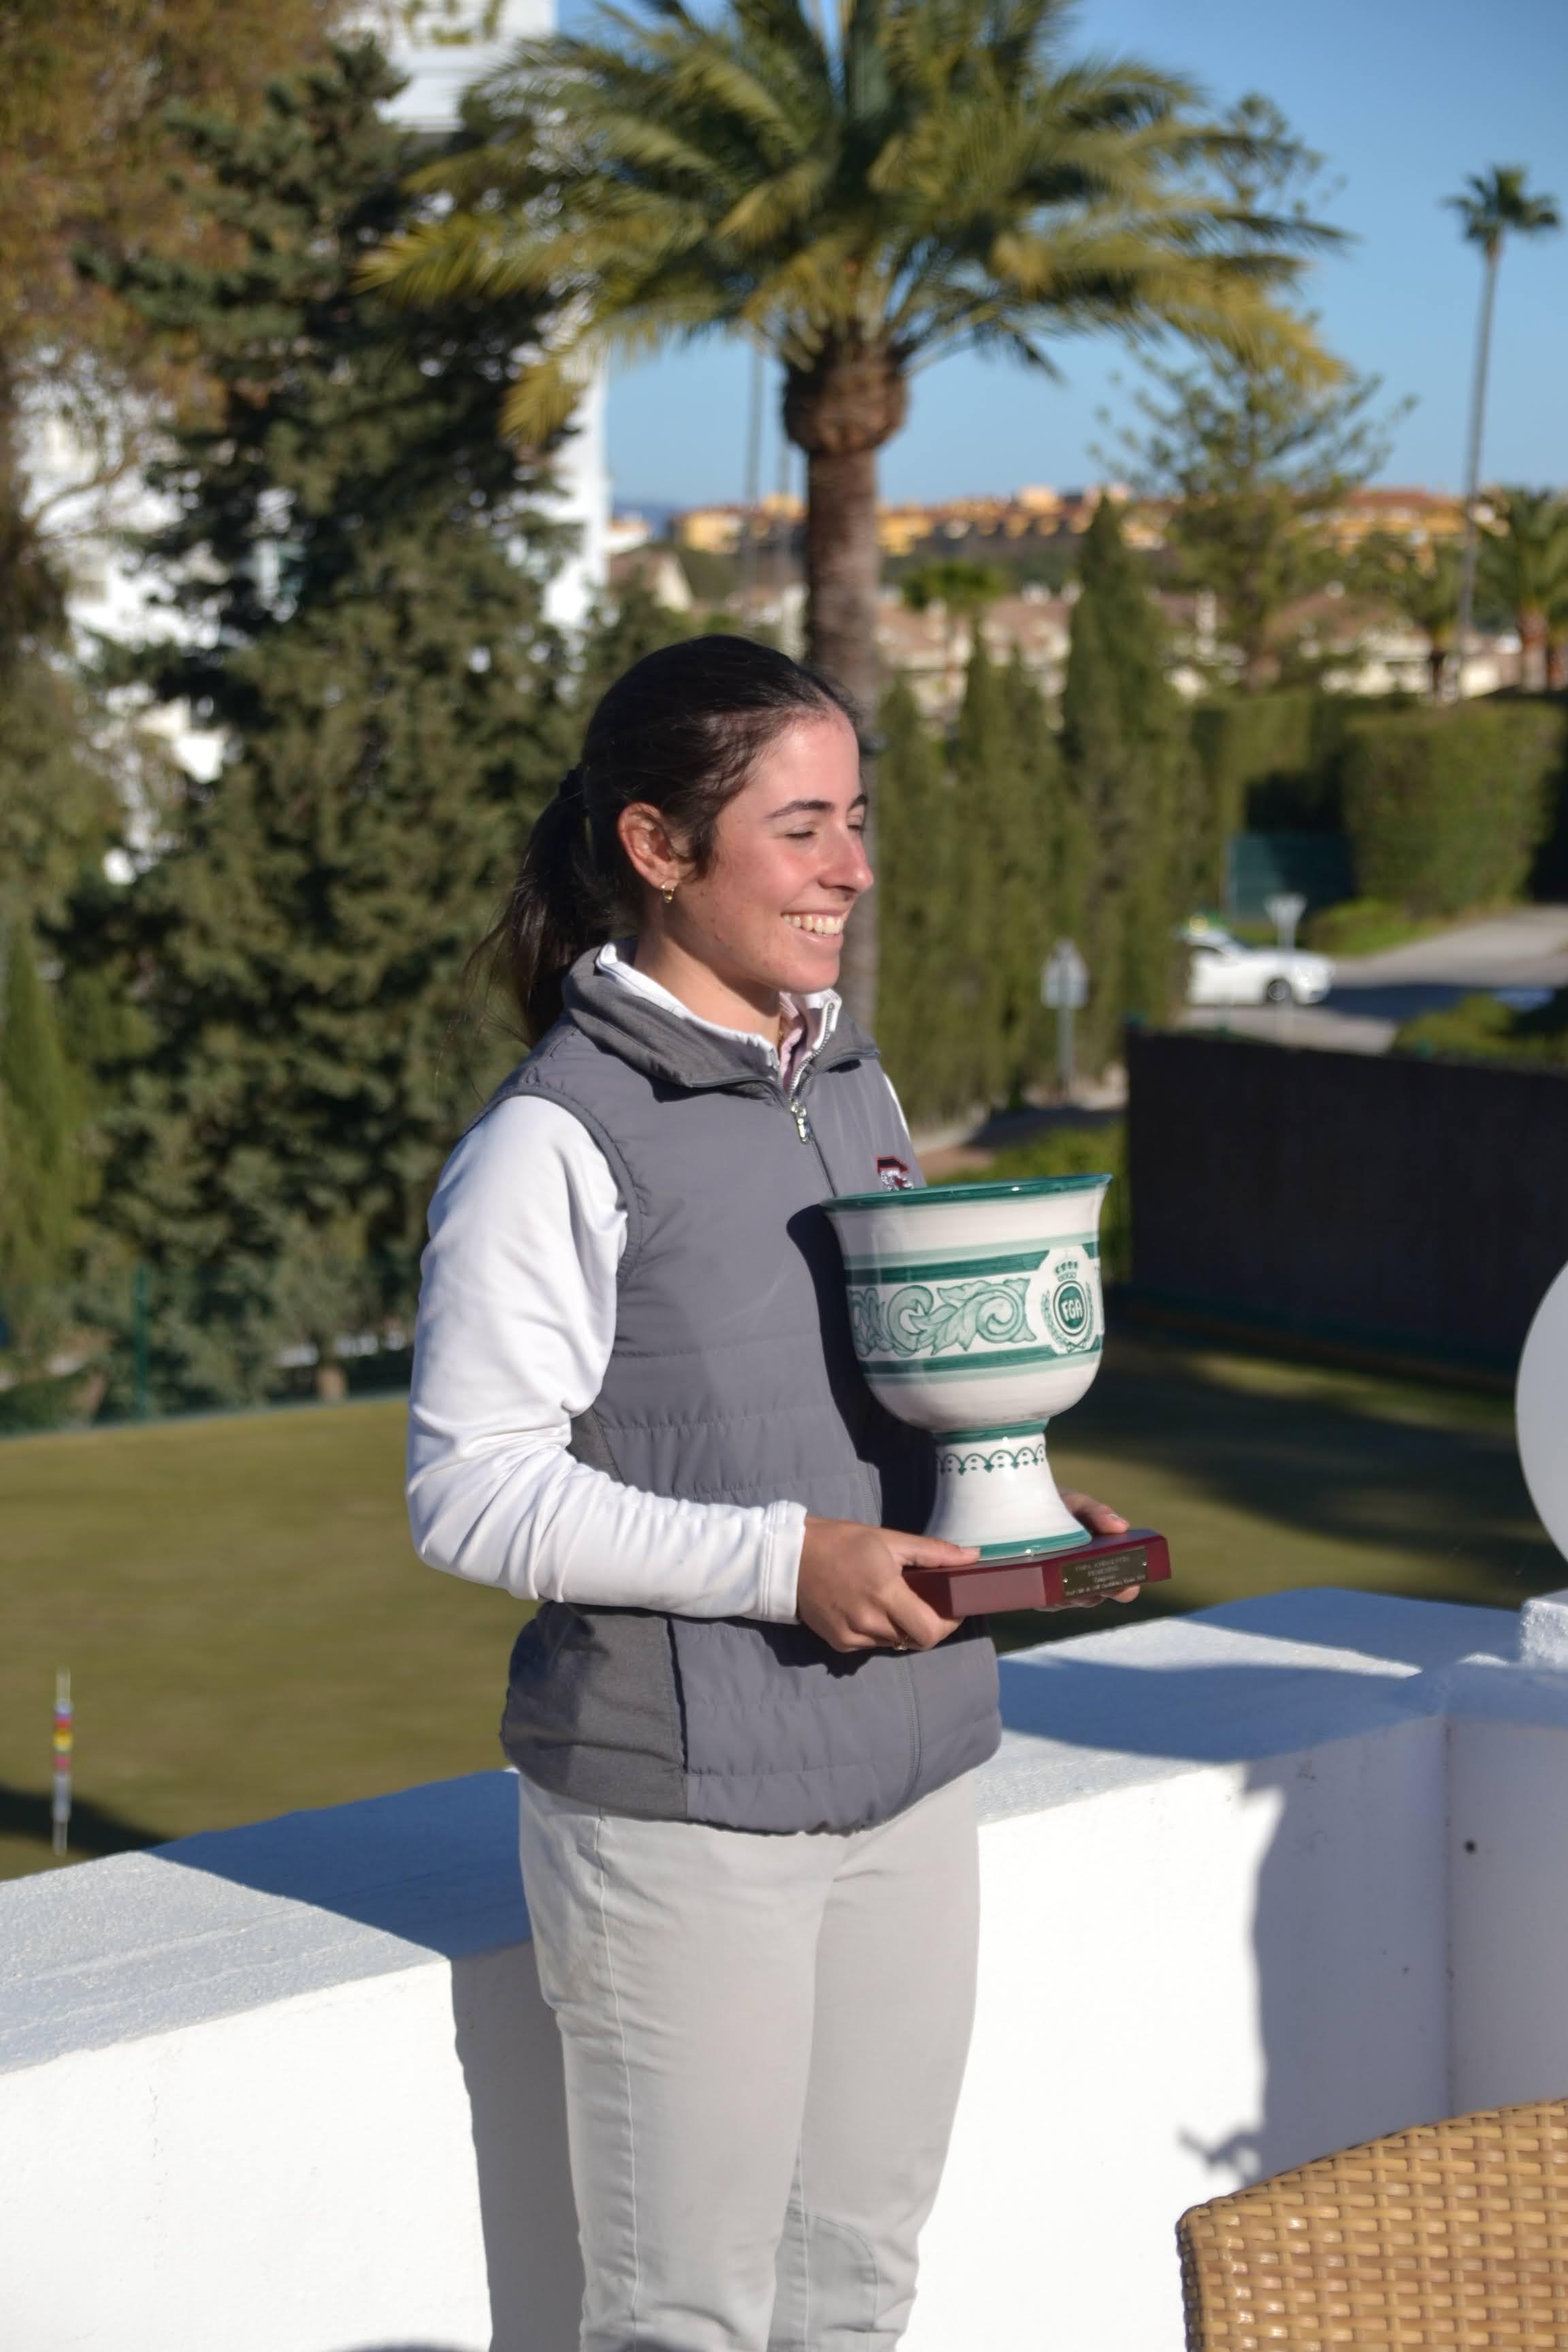 La bicampeona de la Copa Andalucía Ana Peléz. Foto: Rfegolf